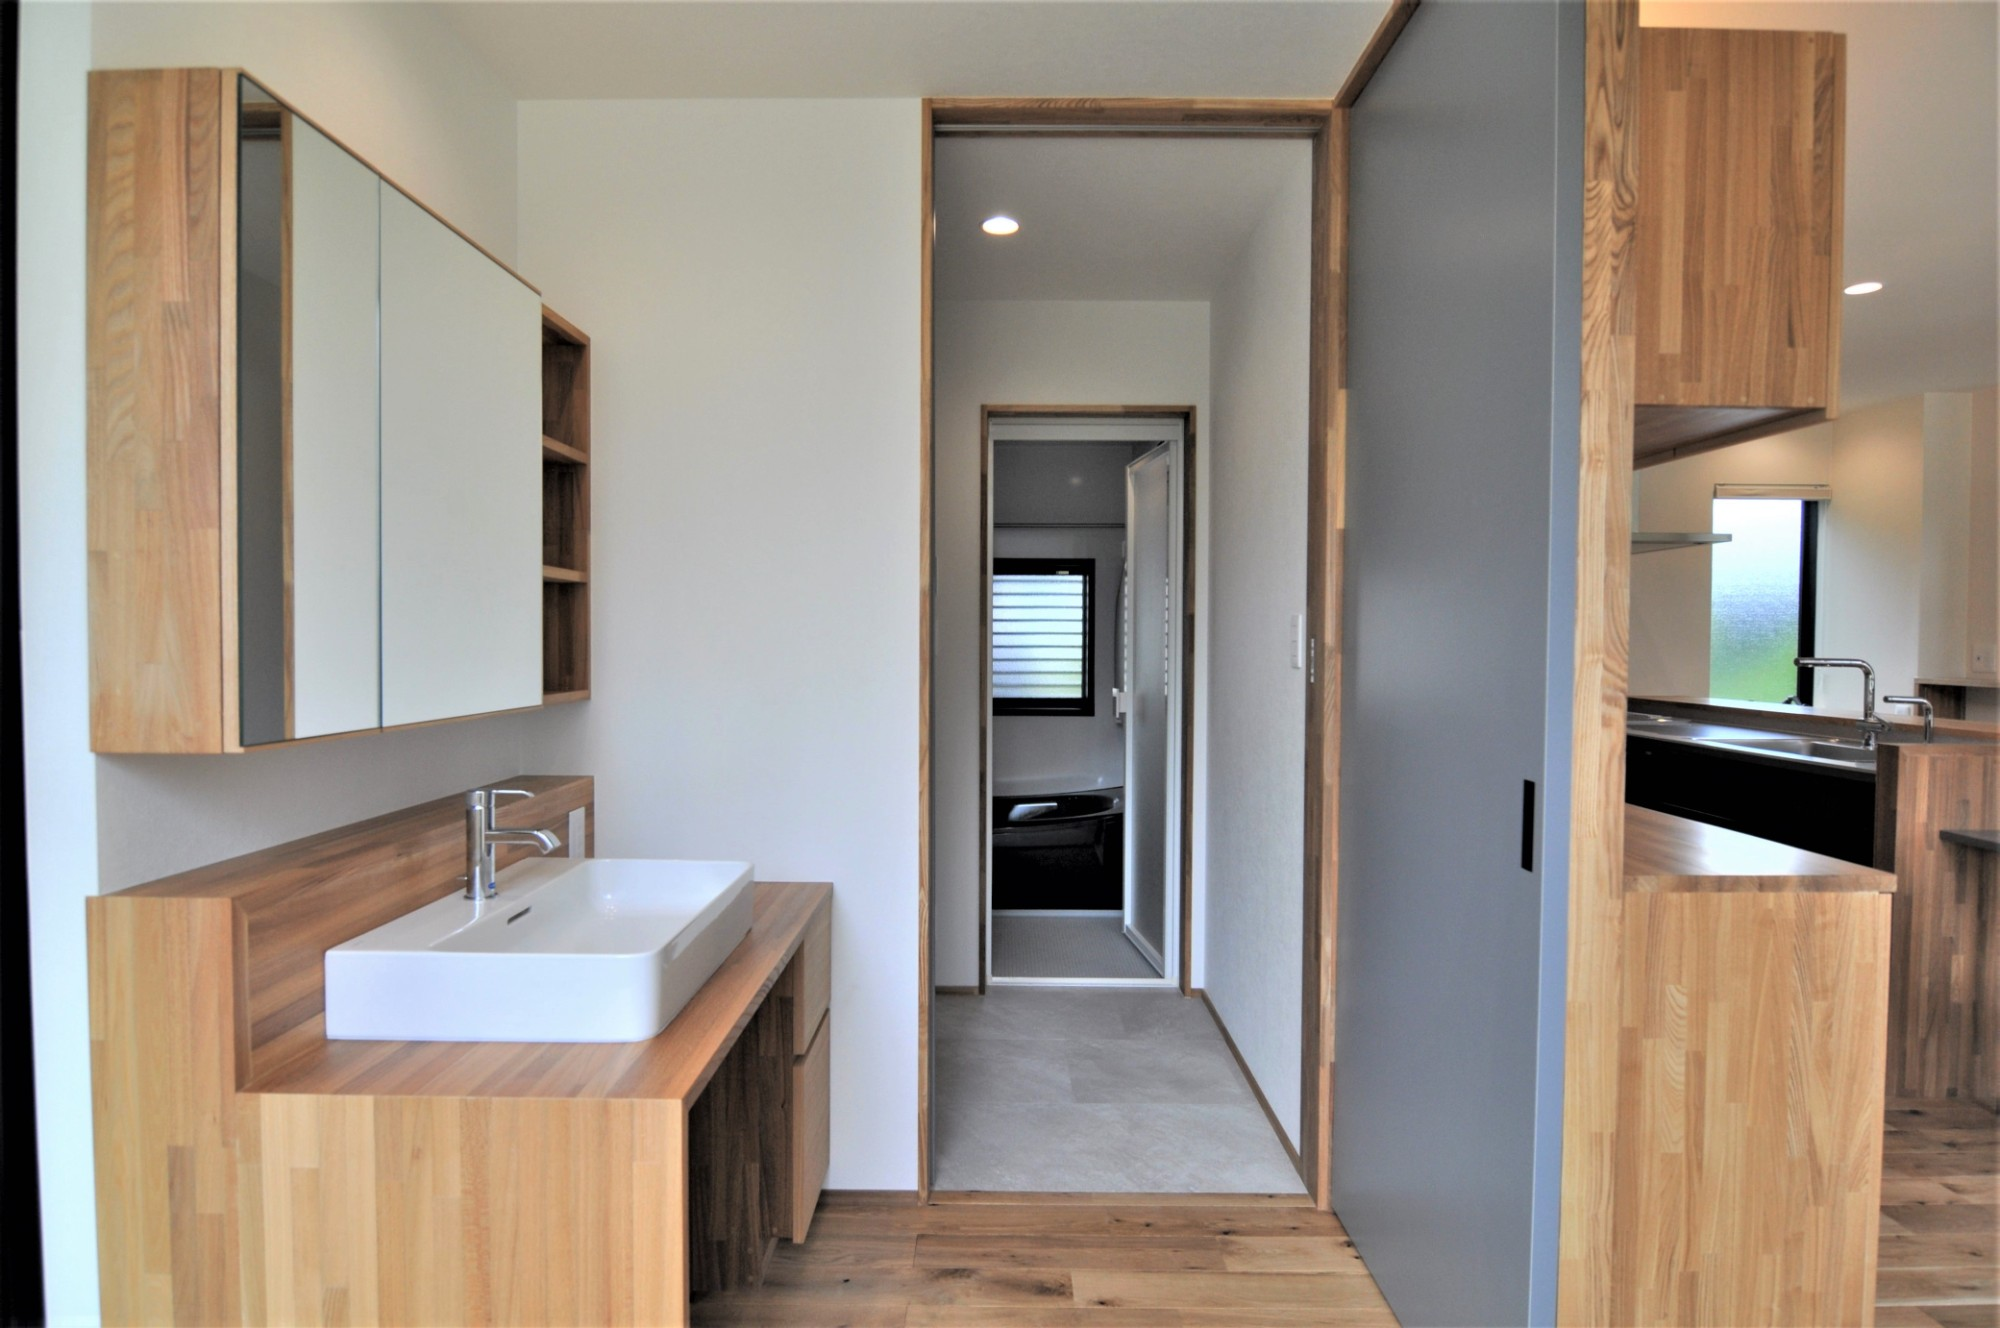 有限会社 市川建築店 1級建築士事務所「オーク床とエッグウォールの調湿住宅(認定低炭素住宅)」の自然素材な洗面所・脱衣所の実例写真